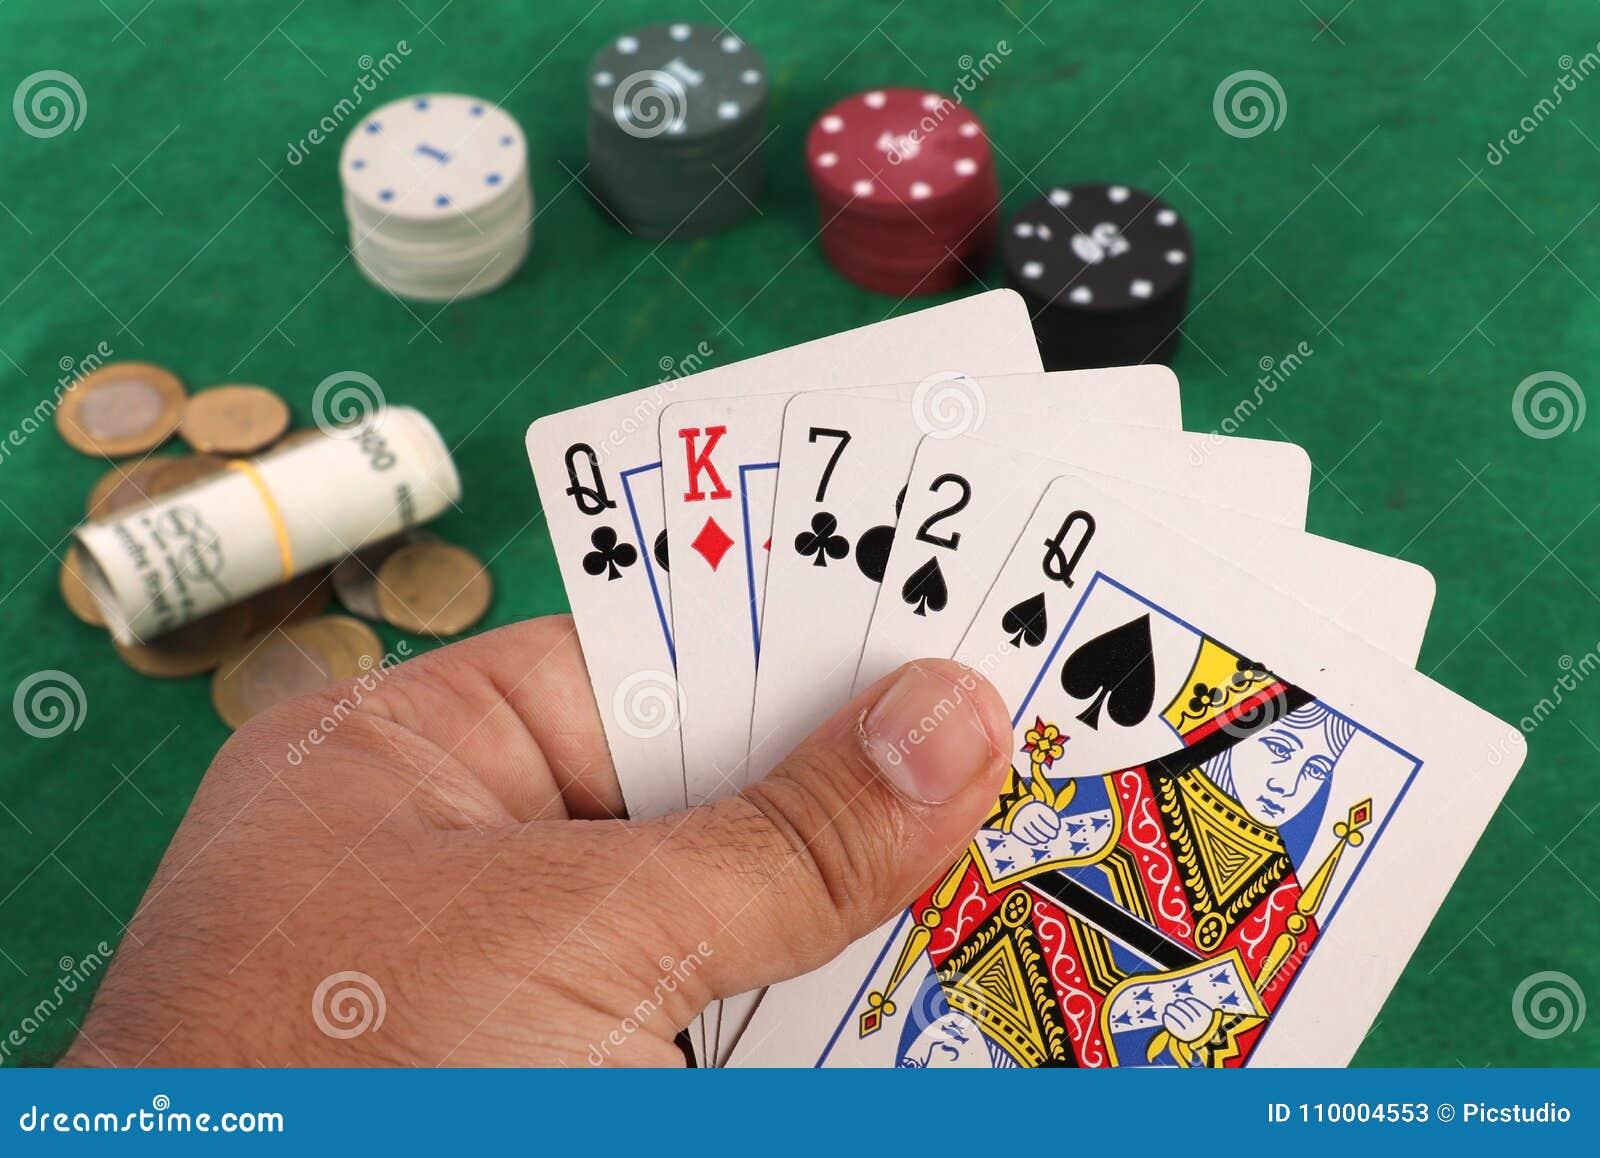 table games gambling card time